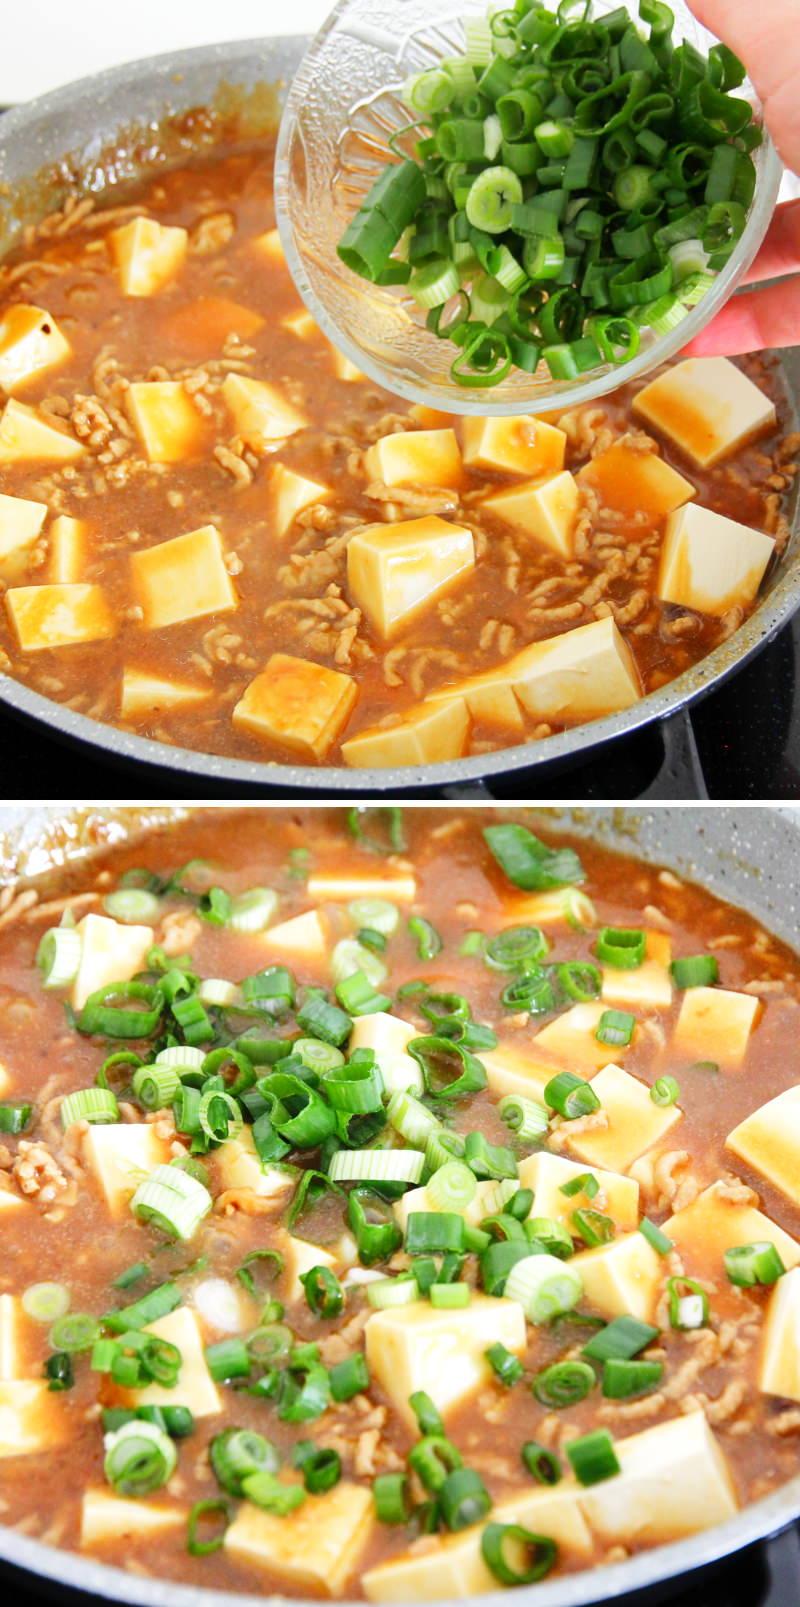 Mapo Tofu Schritt 11 Frühlingszwiebeln dazugeben